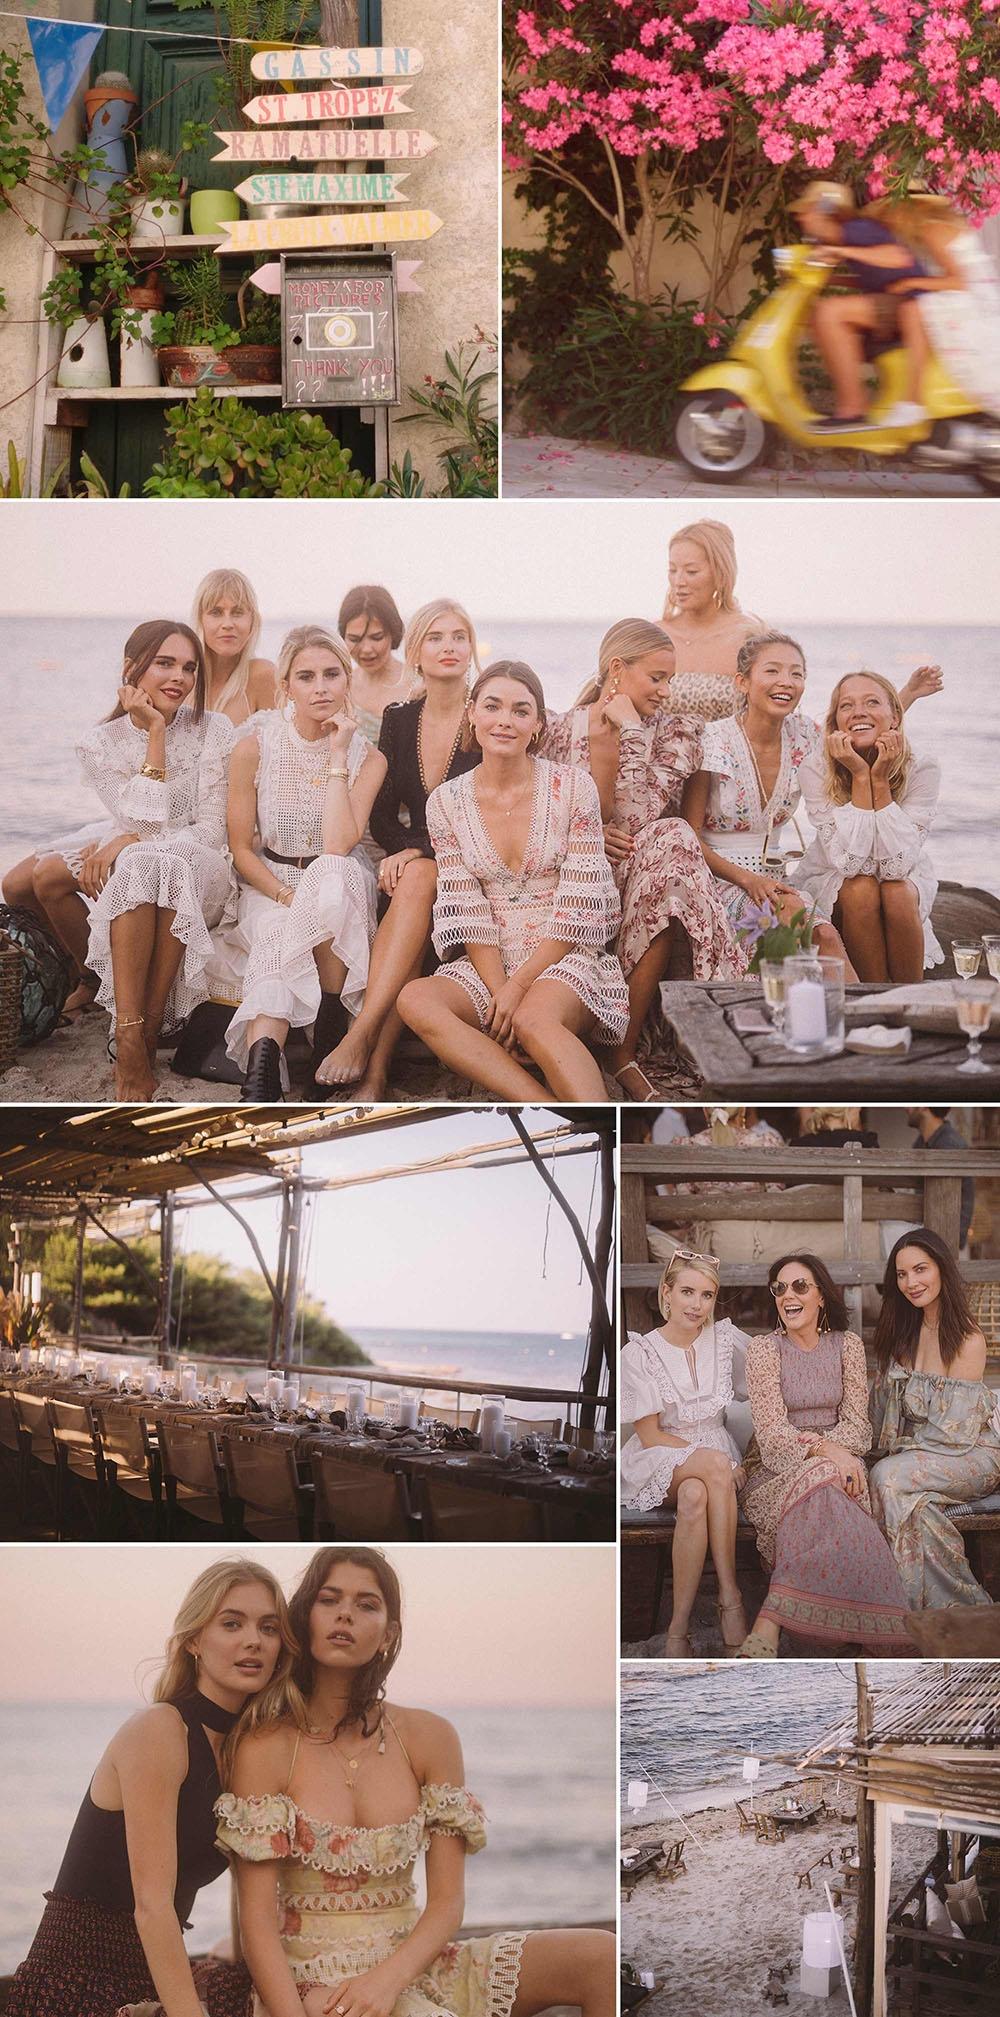 Nicky Zimmermann, friends and details of Saint-Tropez